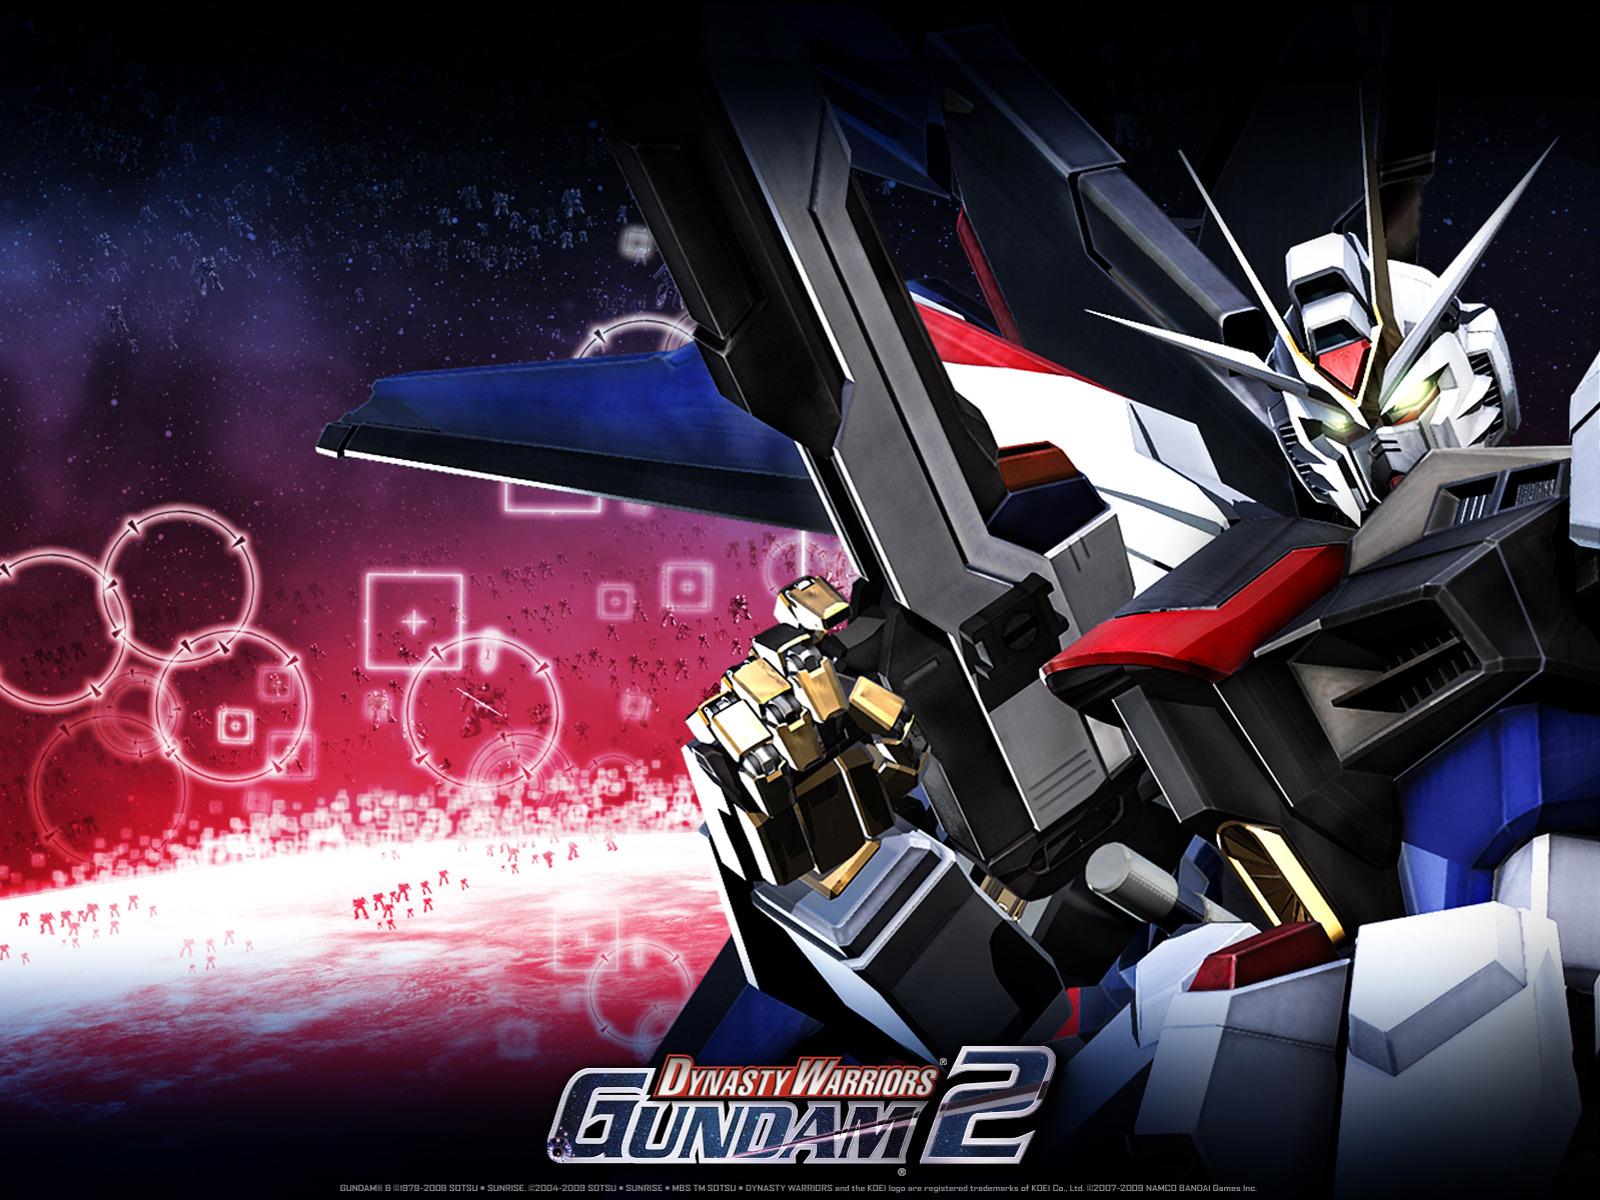 Strike Freedom Gundam Wallpaper Wallpapersafari